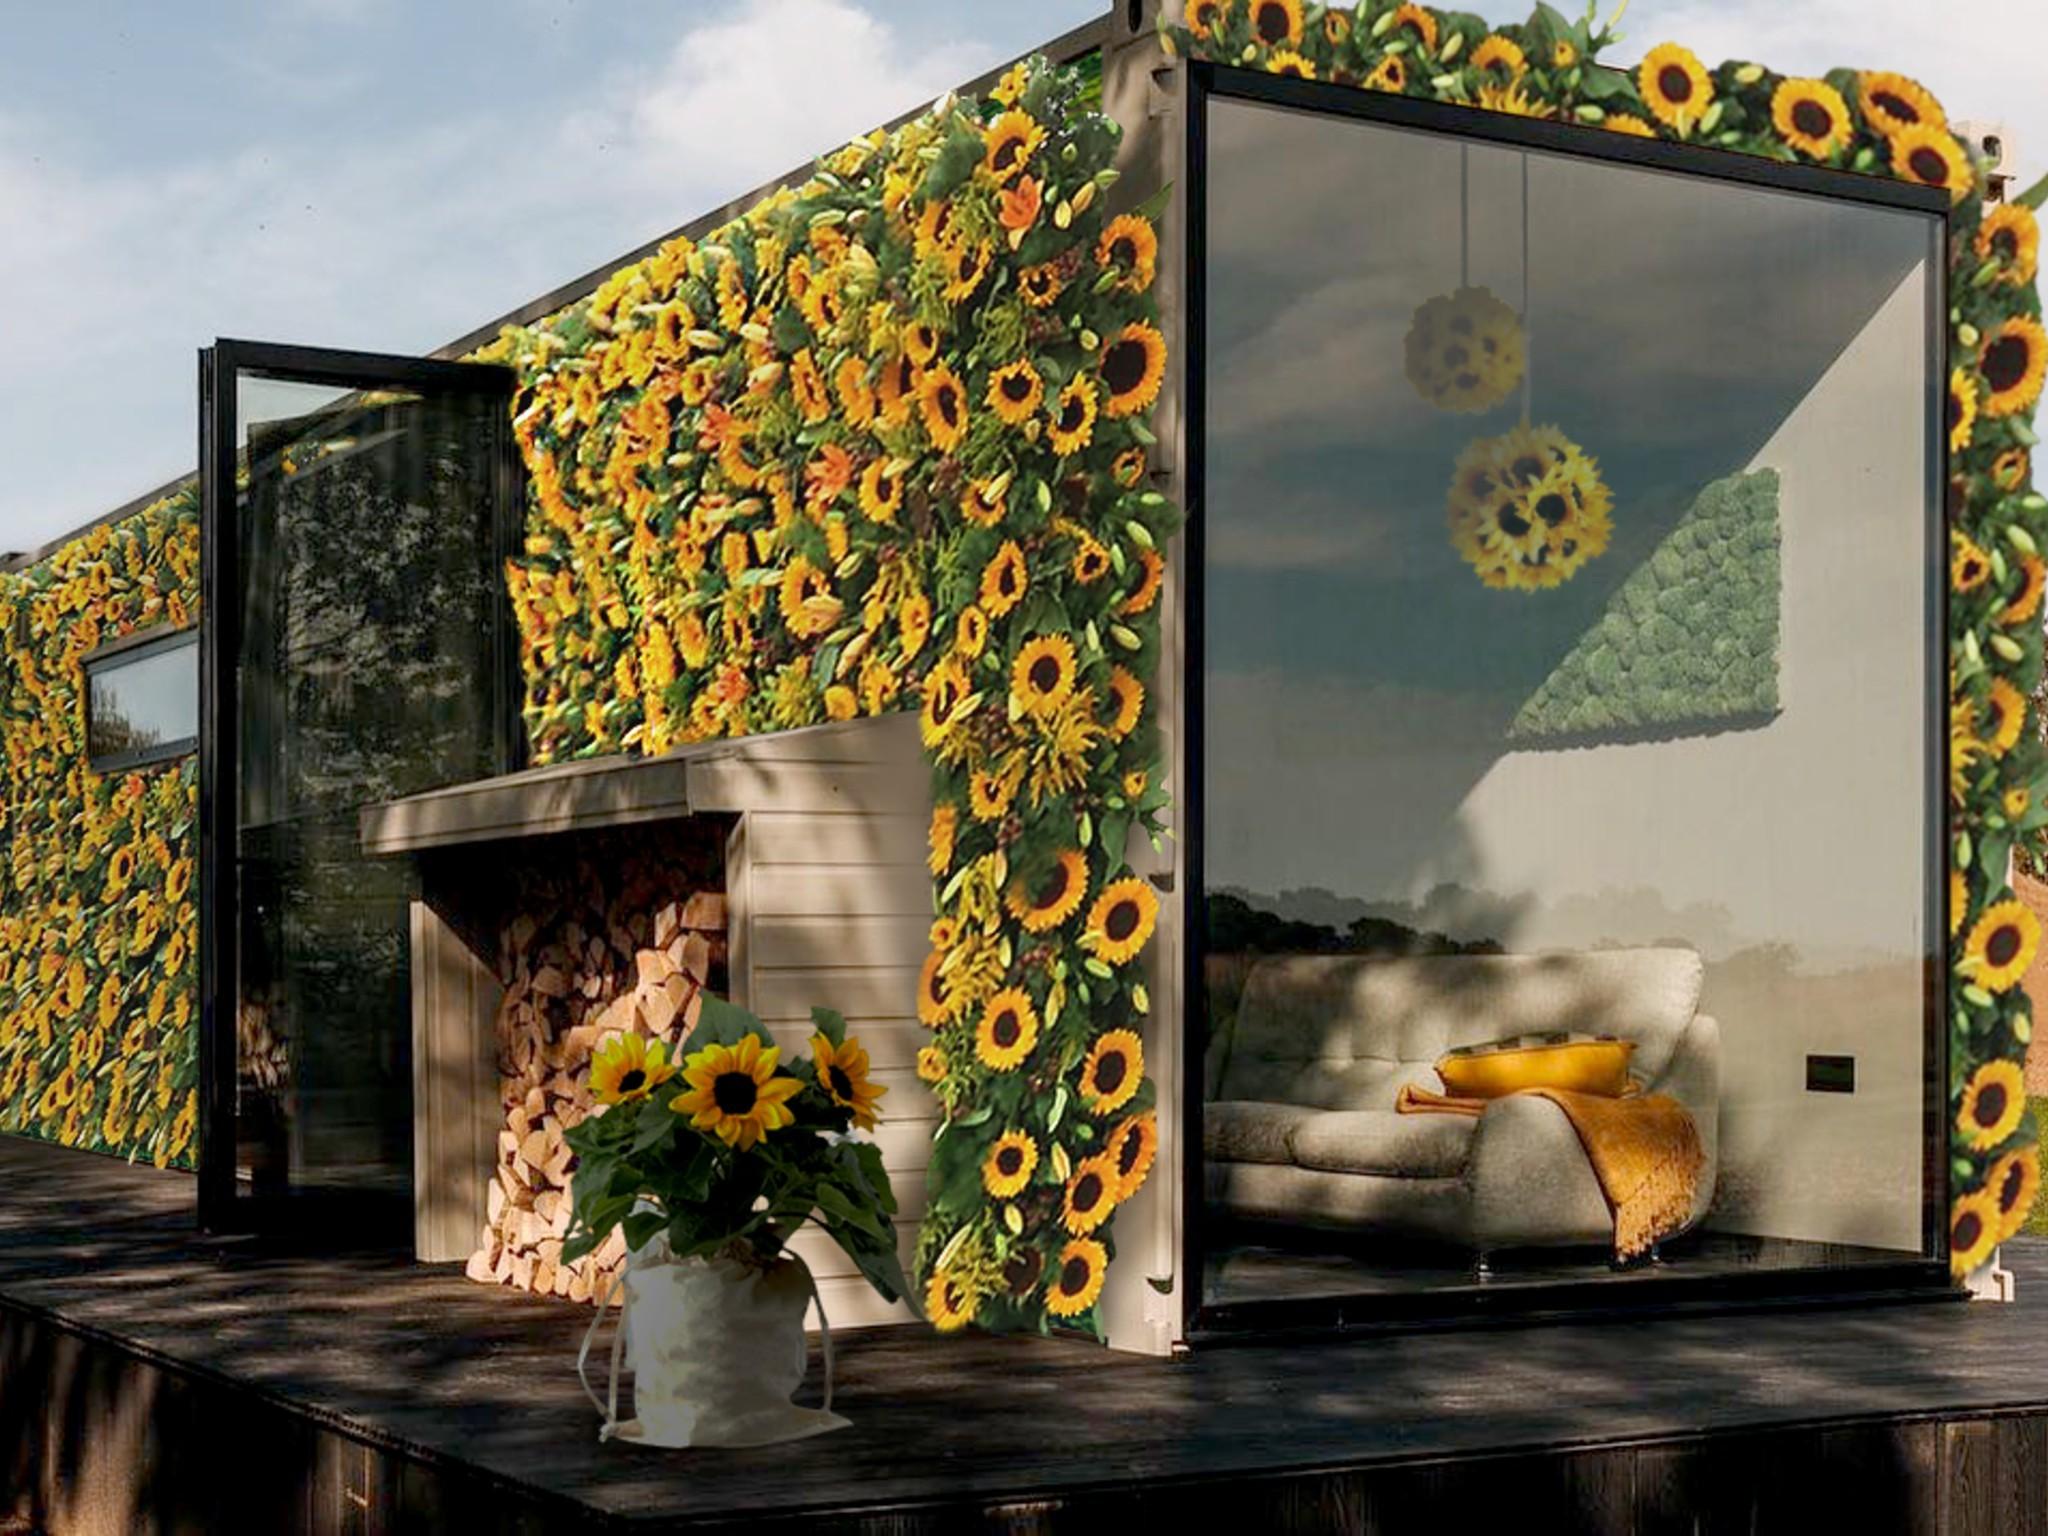 Inspirebox_The Interflora Sunflower Hotel_1